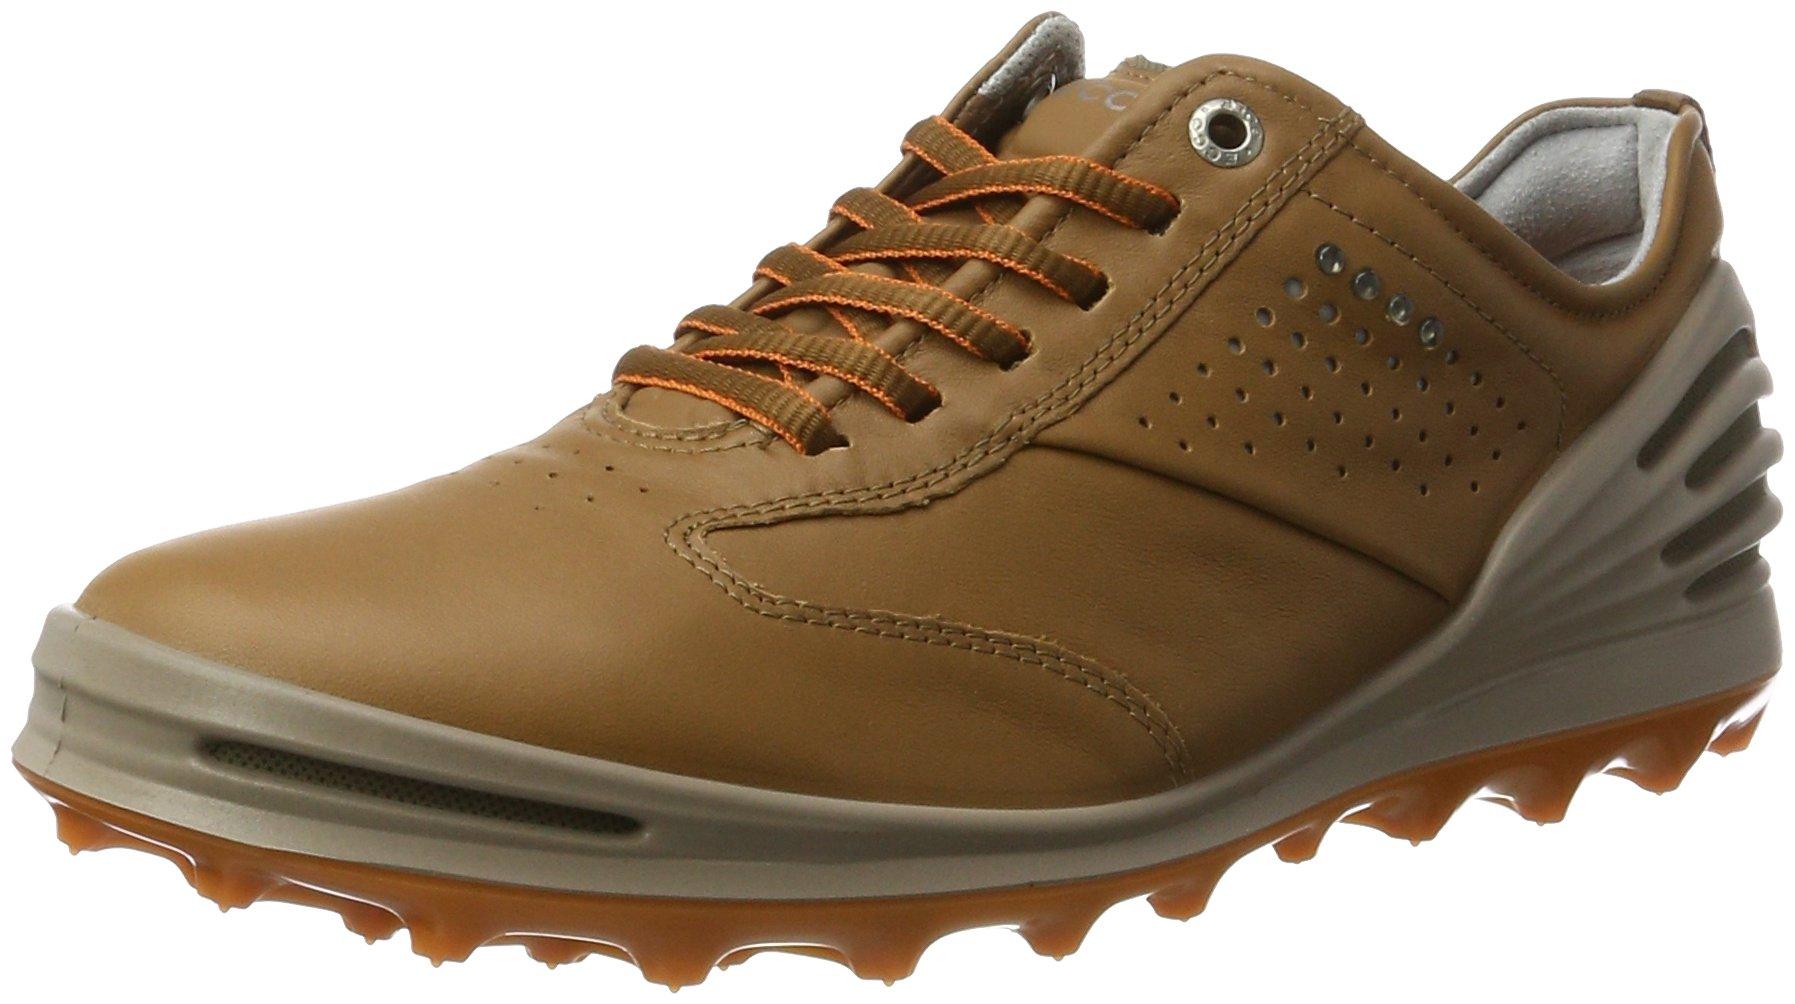 ECCO Men's CAGE PRO Golf Shoe, Camel, 40 EU/6-6.5 M US